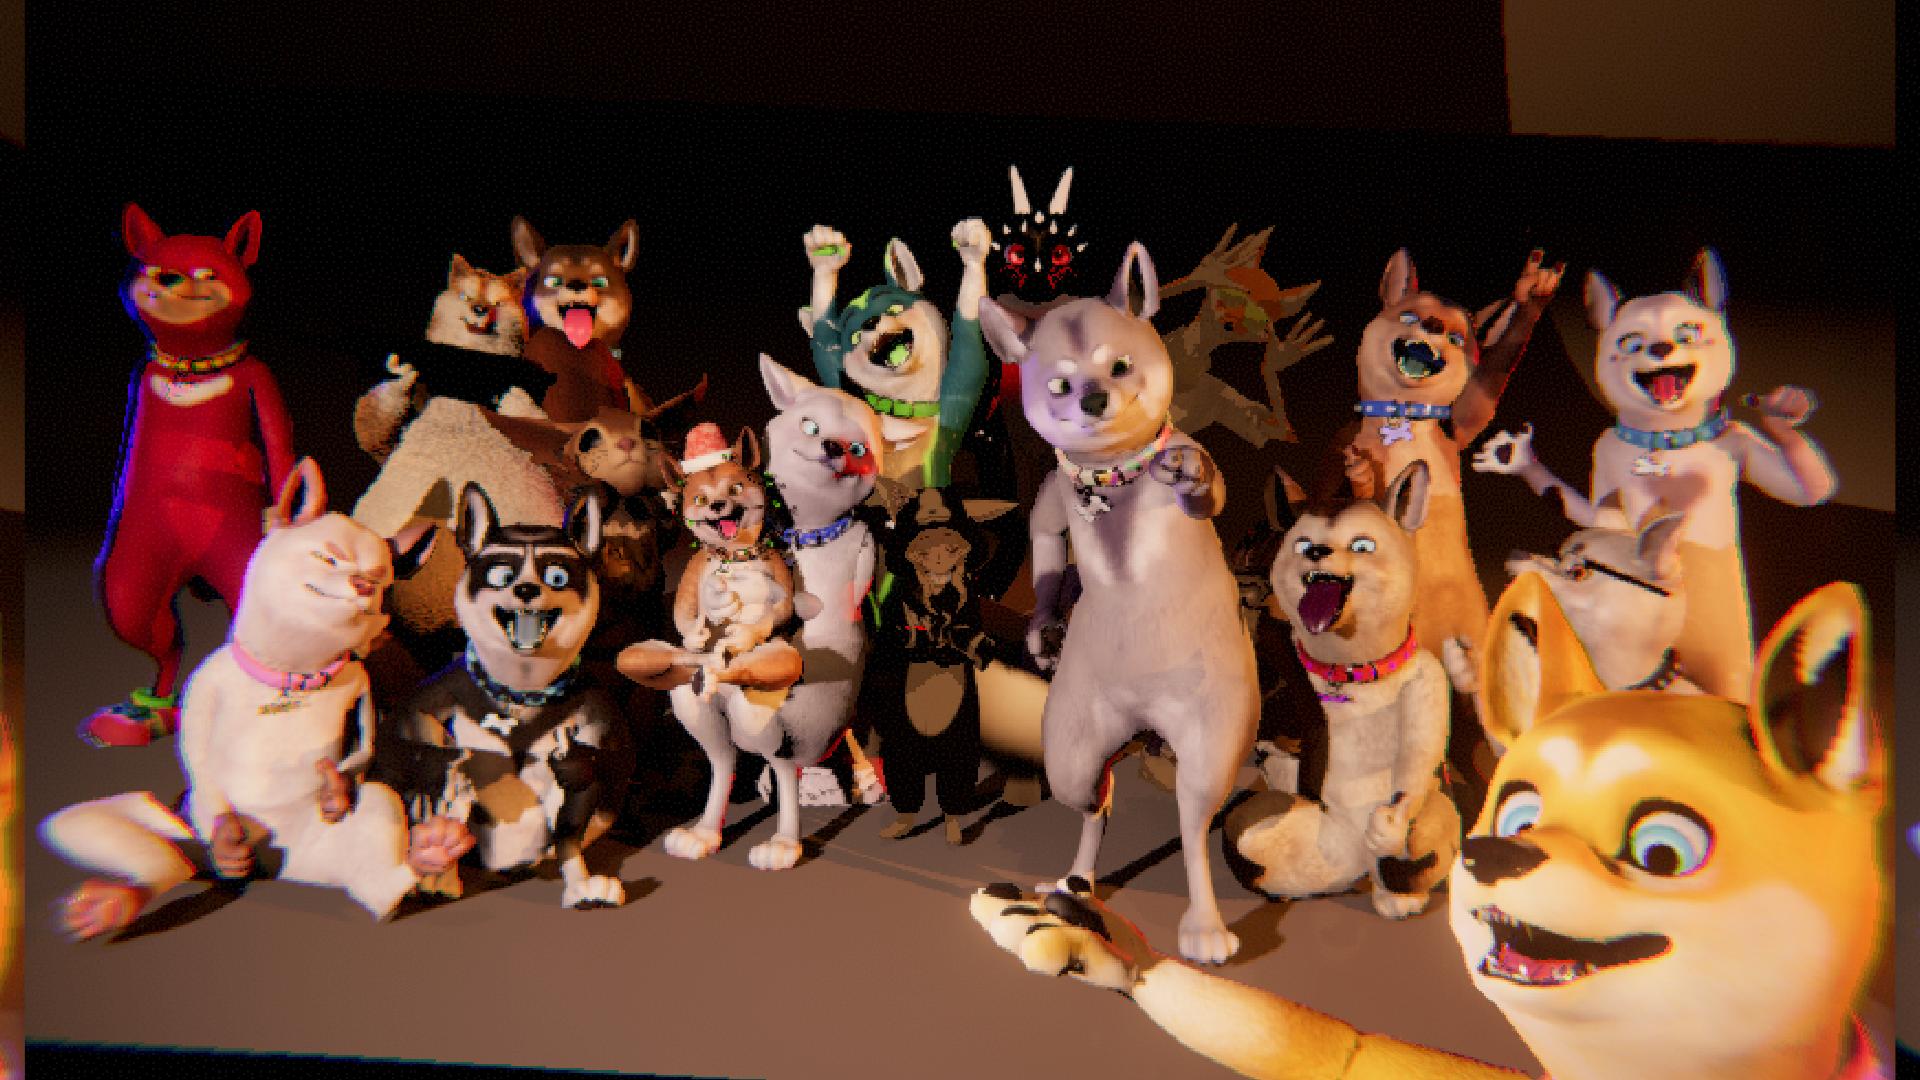 The Shiba Squad which is a social VR phenomenon on social media